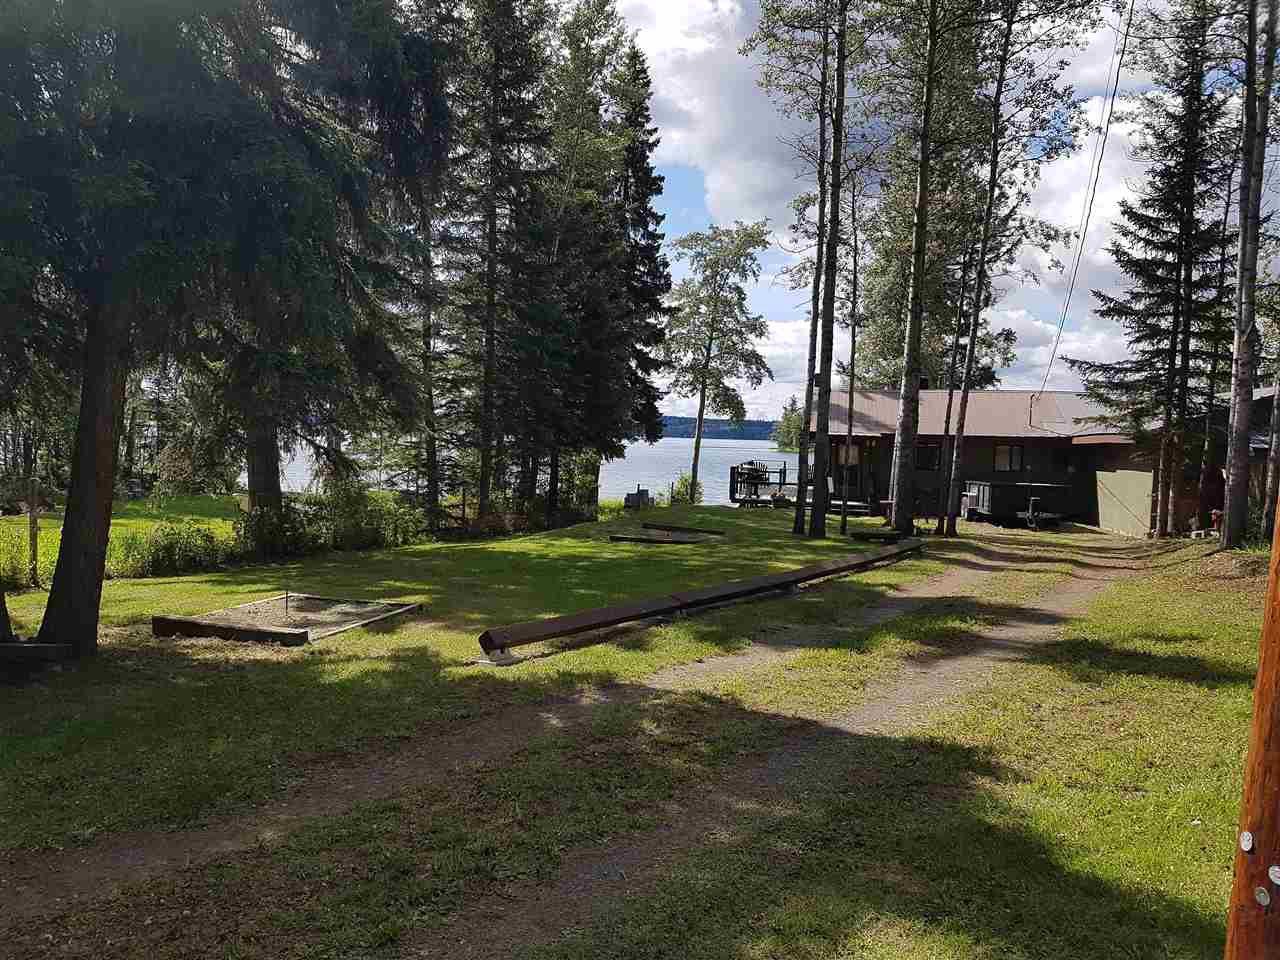 Photo 5: Photos: 7898 DEAN Road in Bridge Lake: Bridge Lake/Sheridan Lake House for sale (100 Mile House (Zone 10))  : MLS®# R2274404